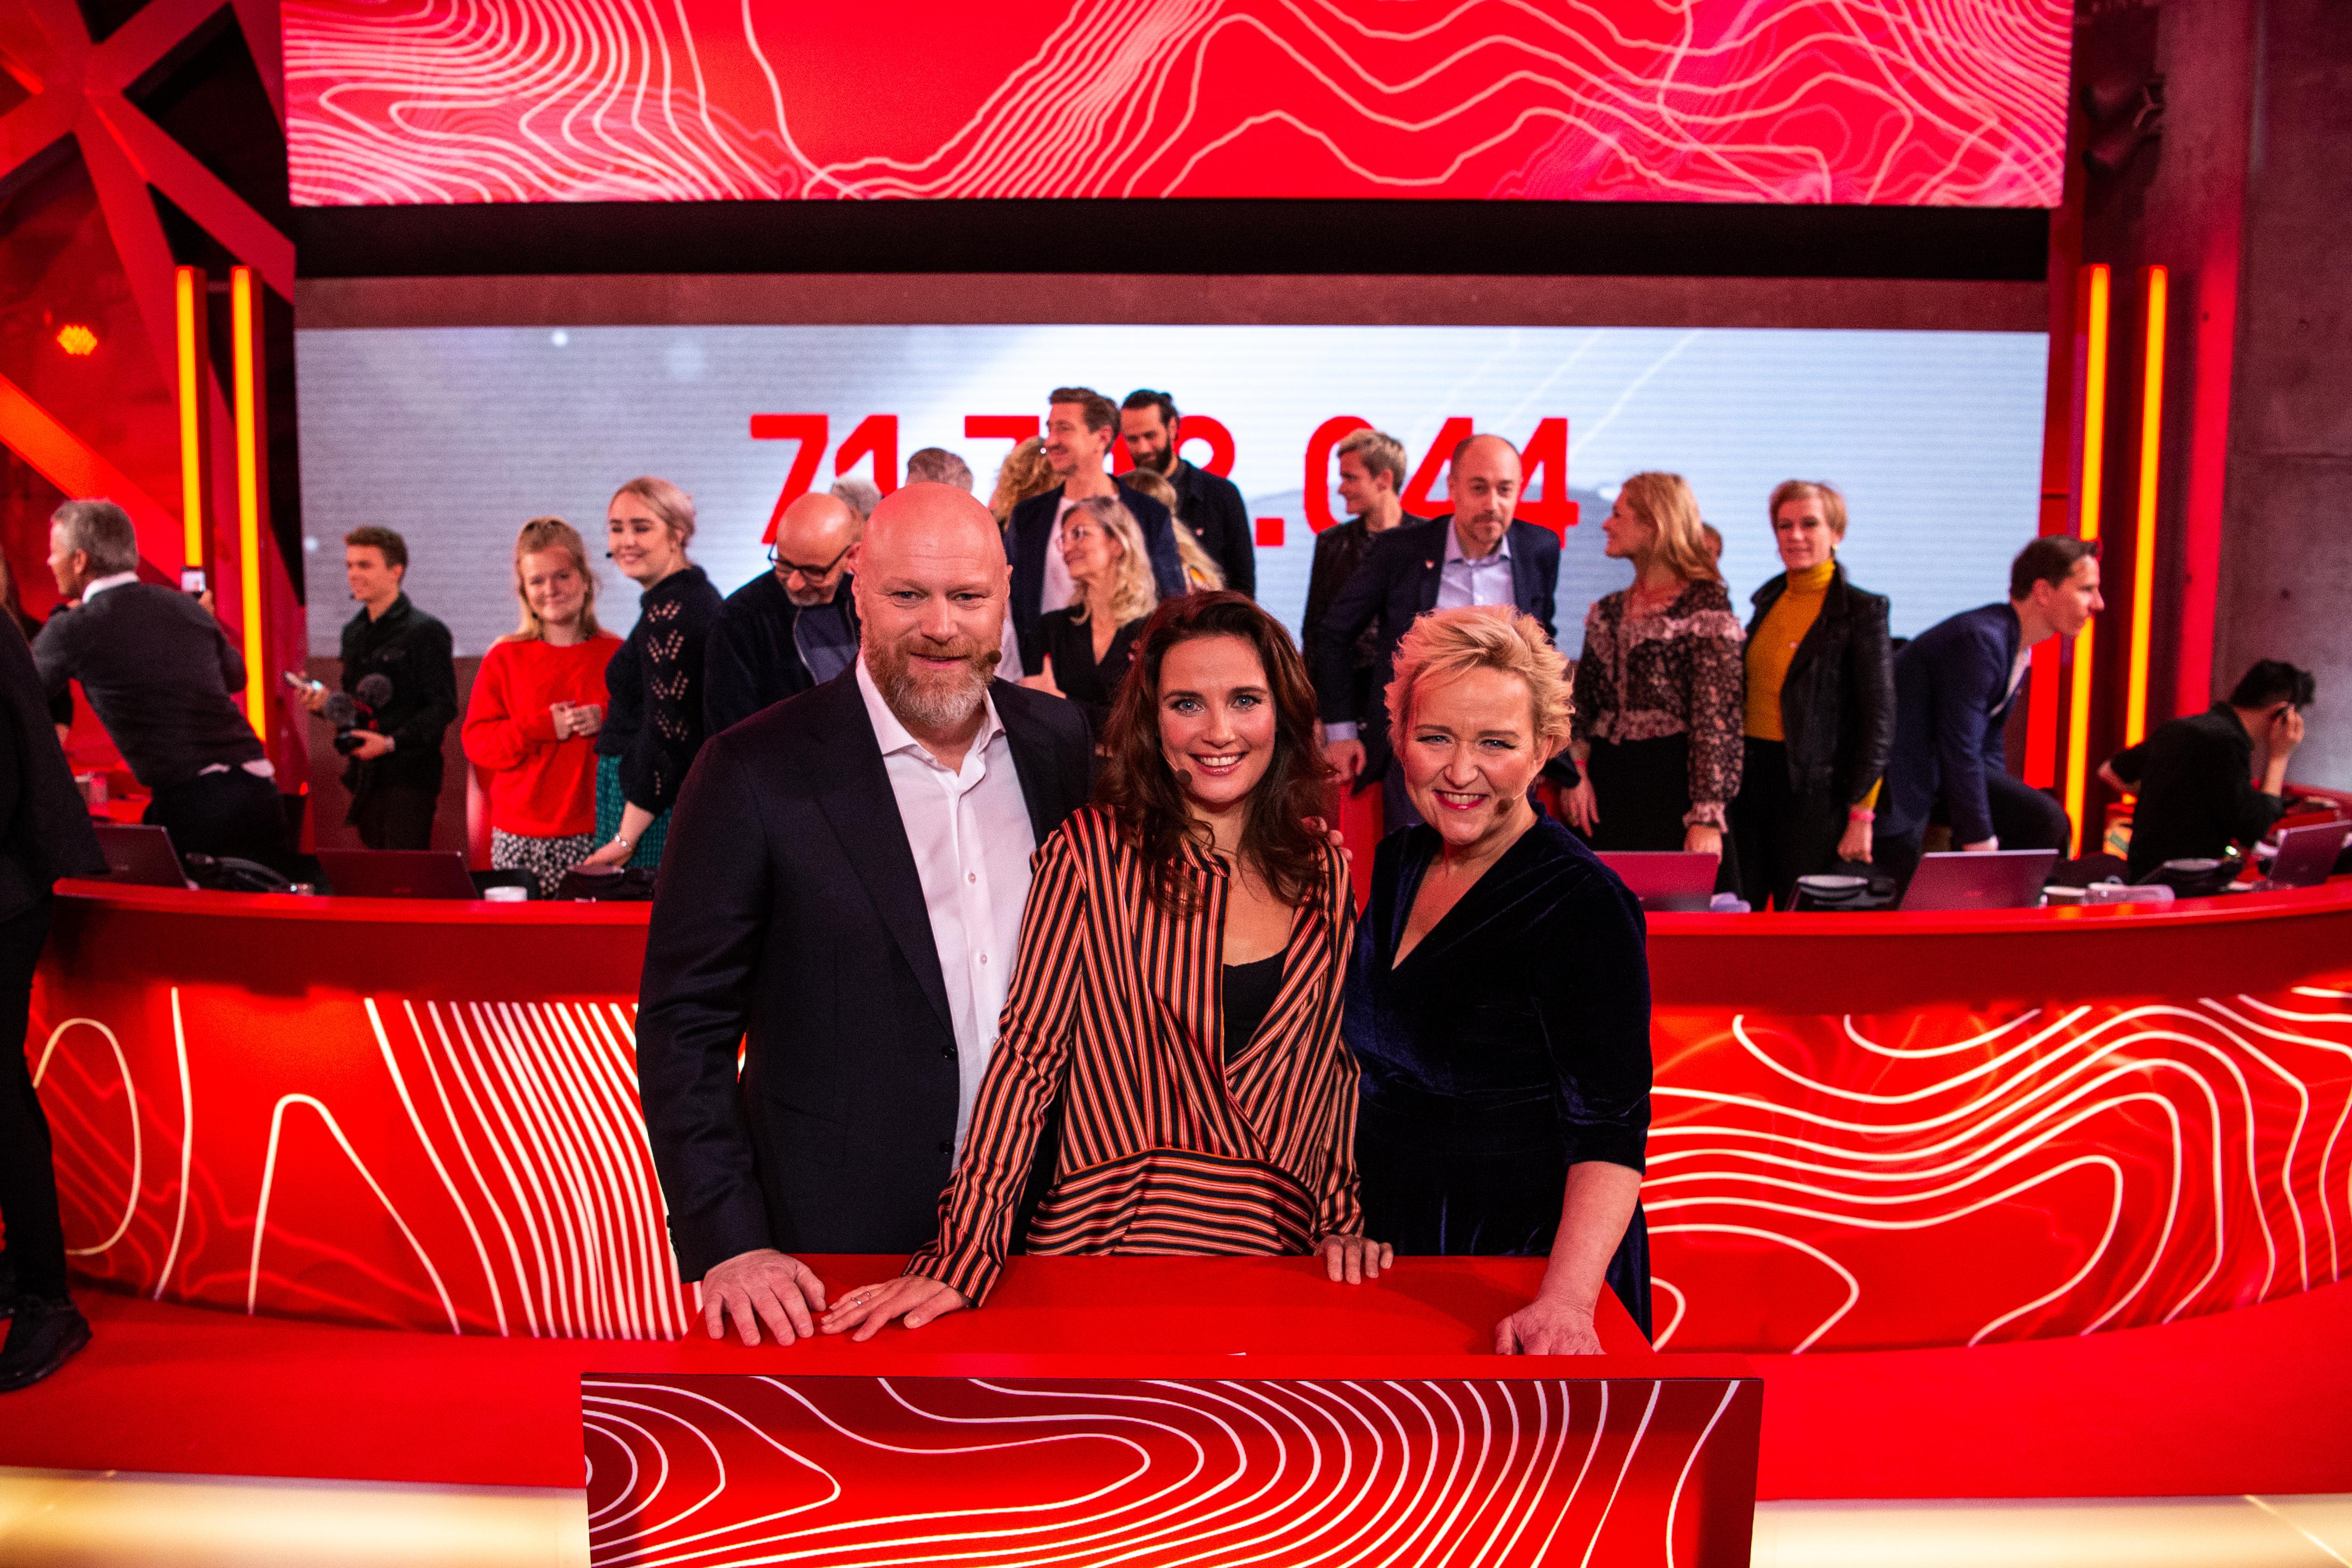 Danmarks Indsamling 2019 - Styrk verdens piger